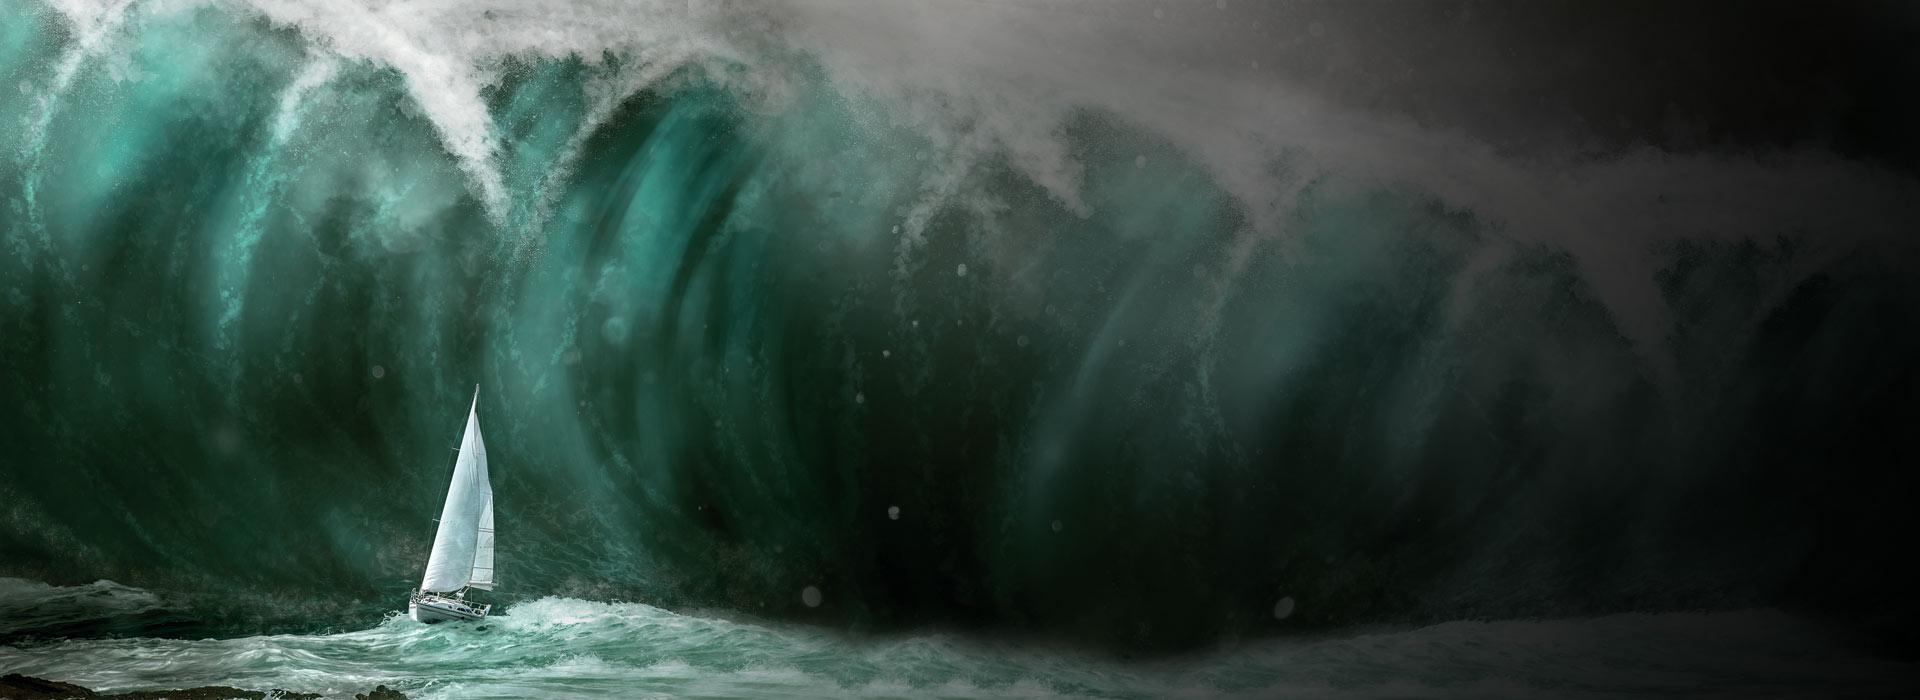 Como viver neste mundo tempestuoso?